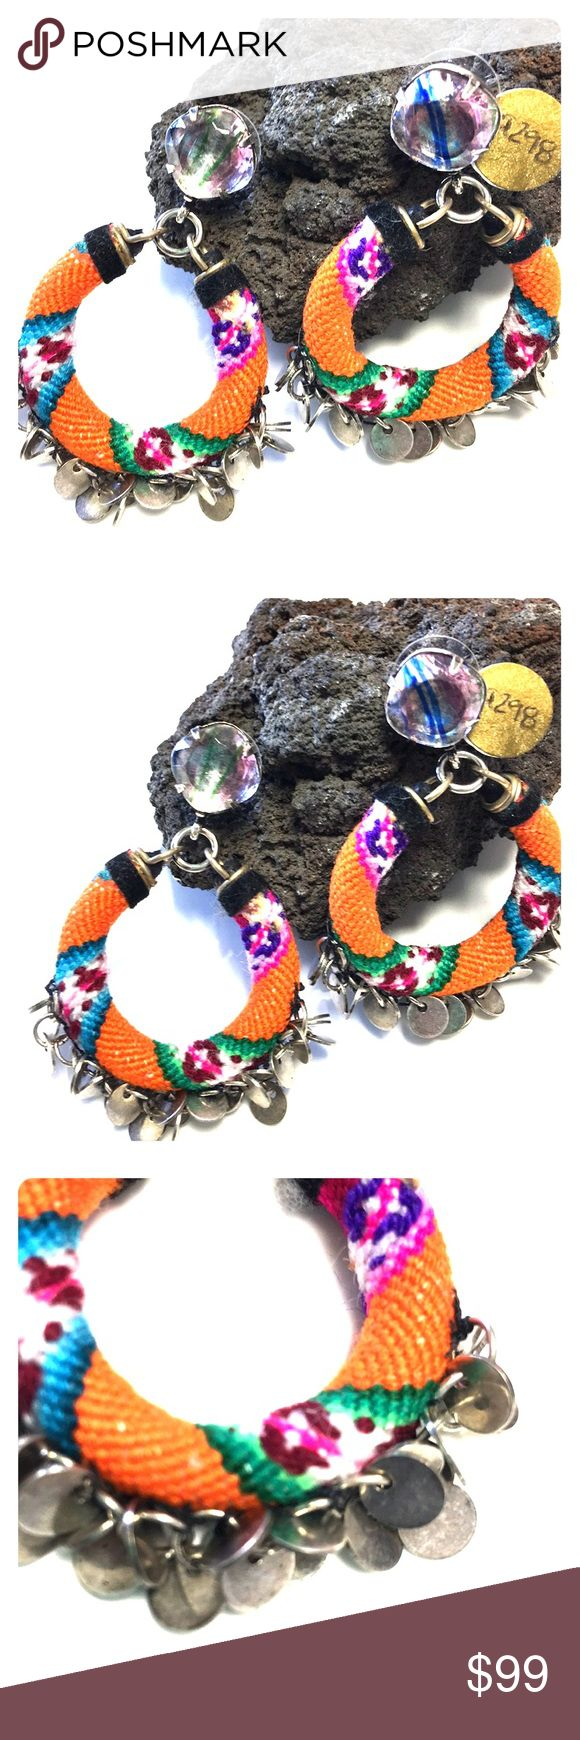 "Anthropologie Designer Fiesta Silver Hoop Earrings Store overstock; New with tags; Anthropologie Designer Fiesta Silver Hoop Earrings- 2"" in Length Anthropologie Jewelry Earrings"